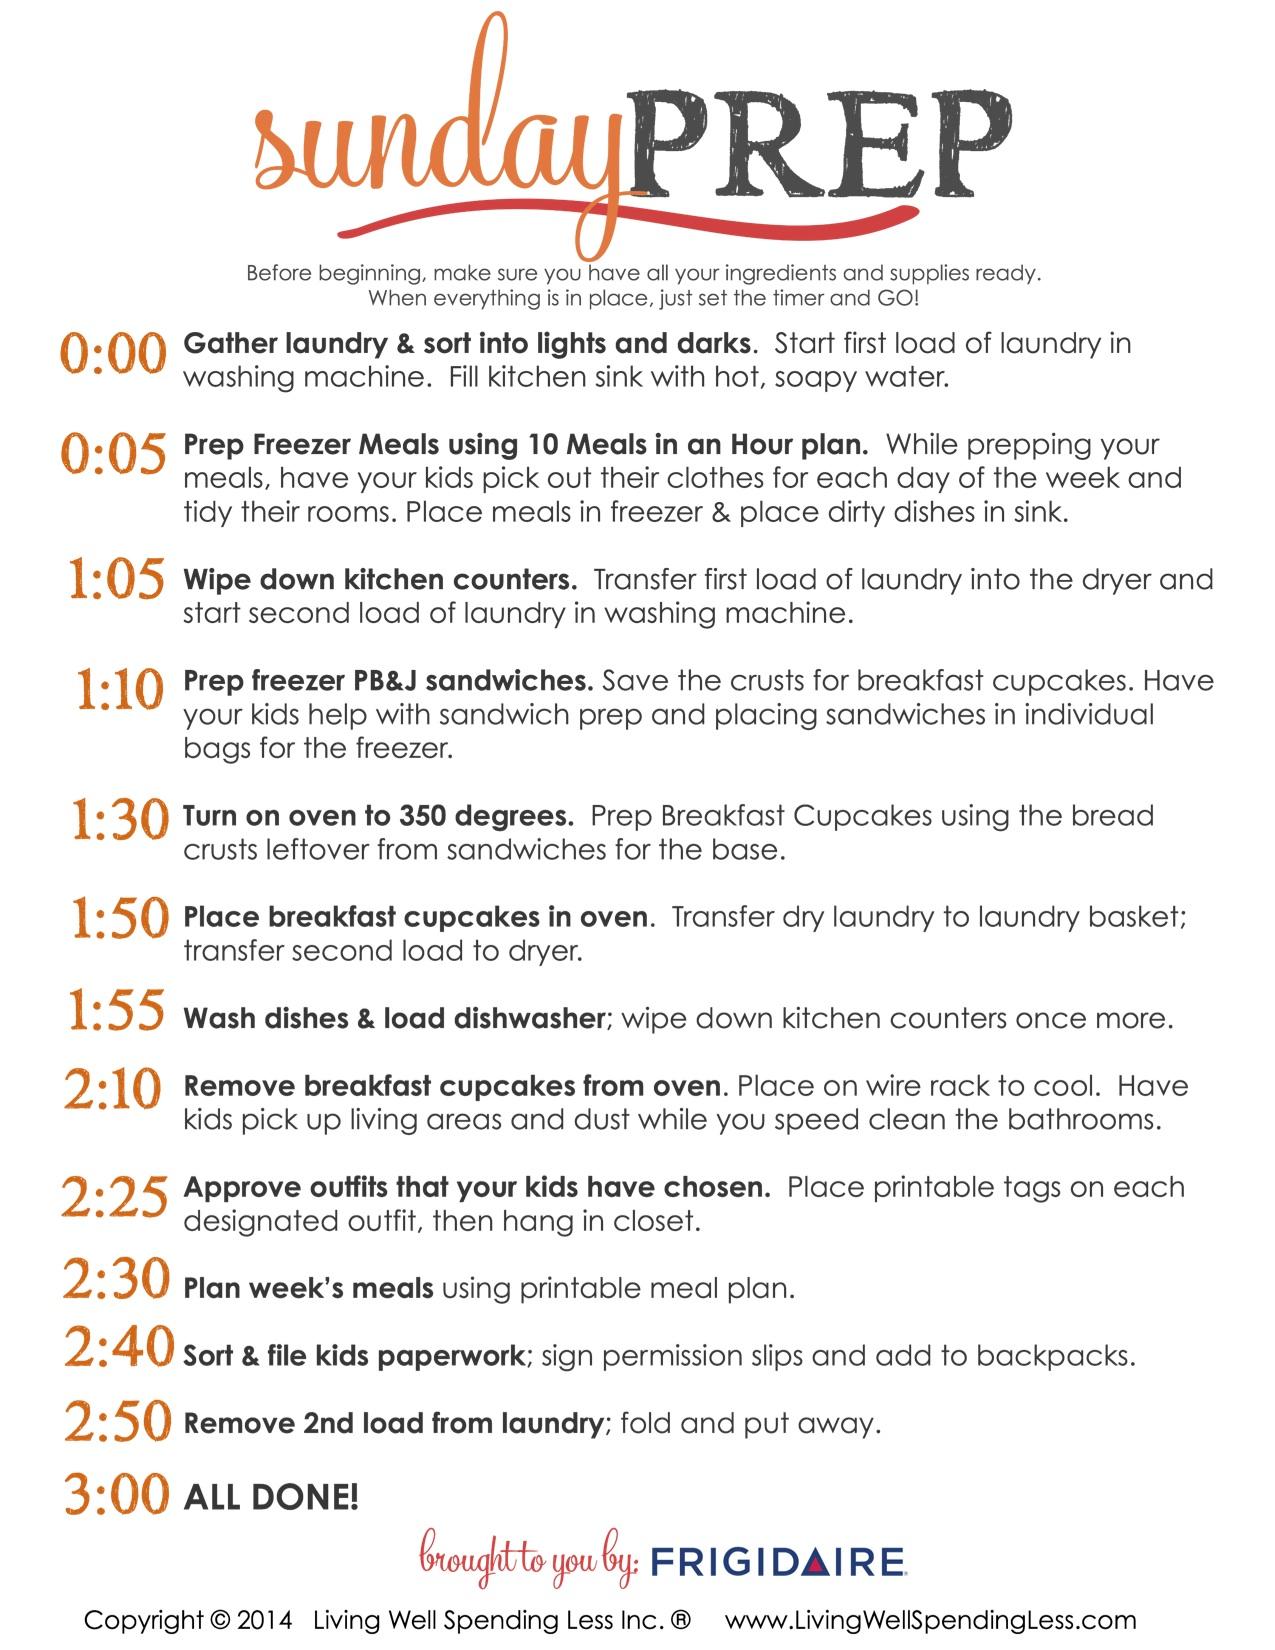 Sunday Prep Action Plan